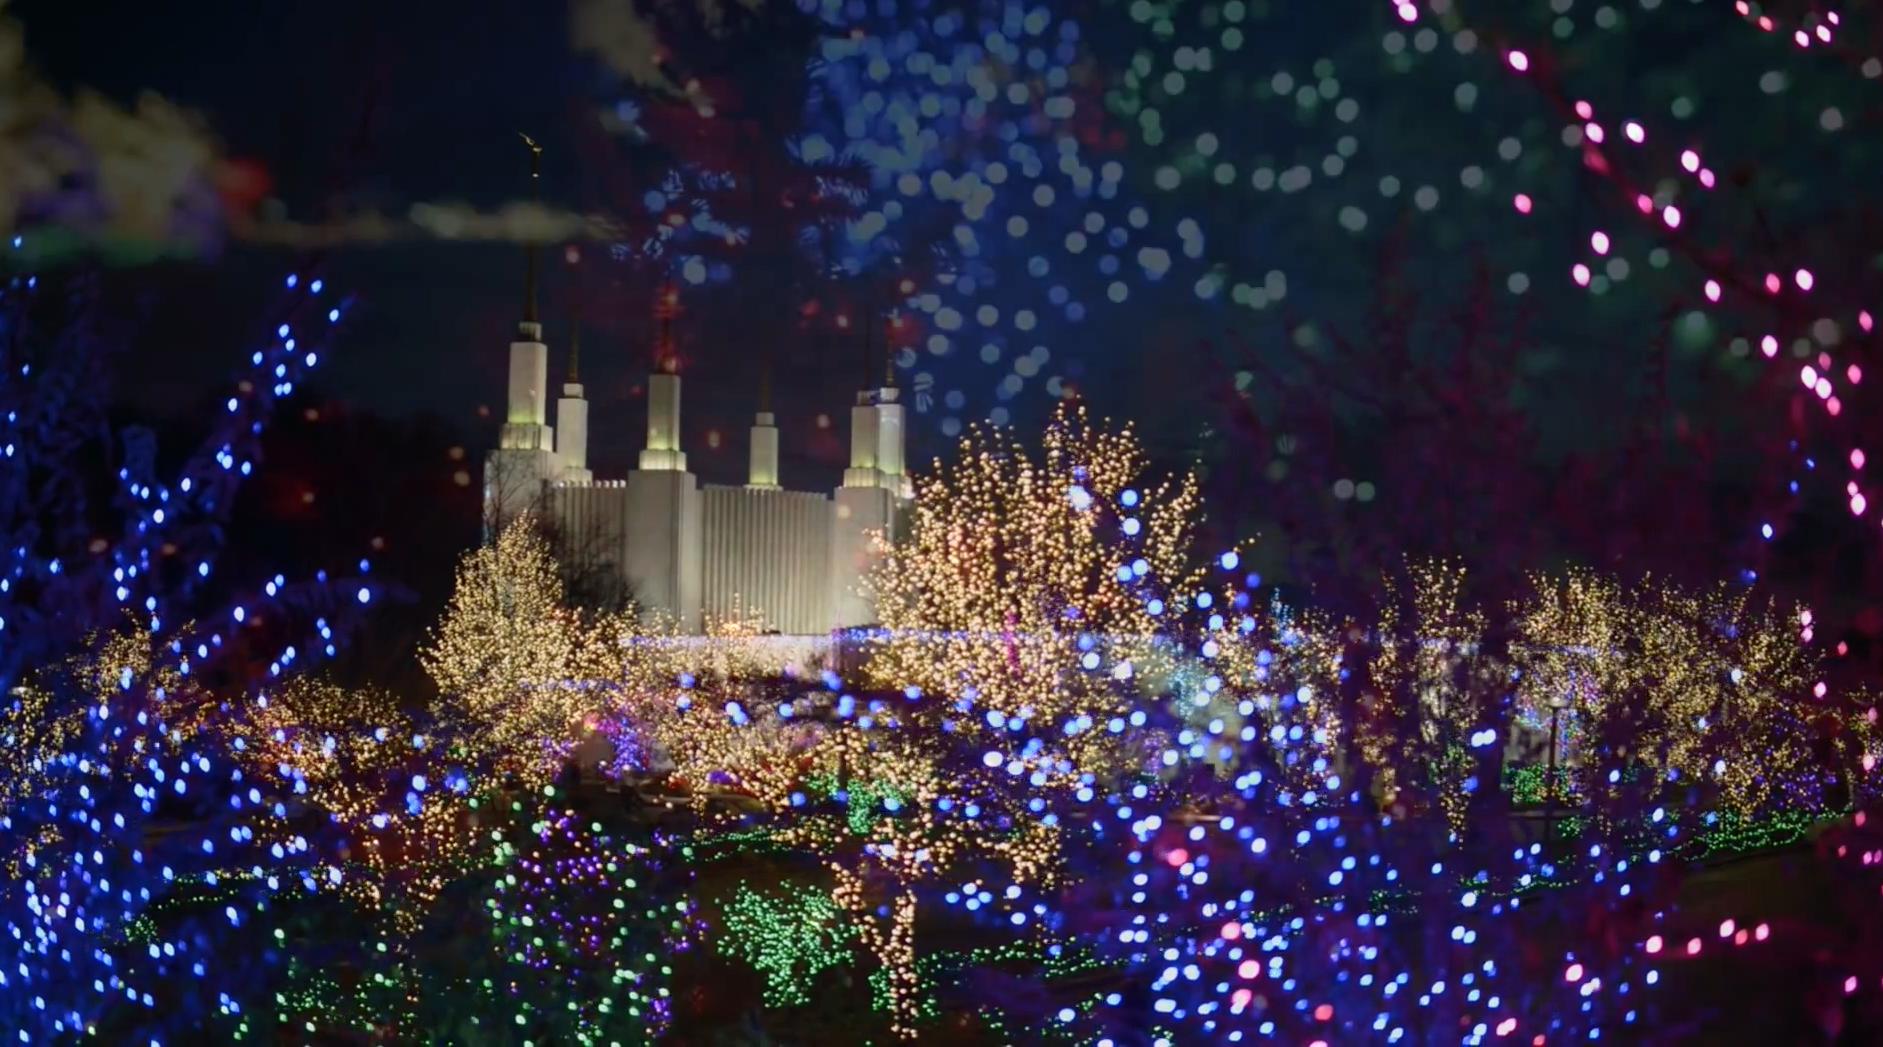 41 Festival Anual de las luces a  partir del 29 de noviembre